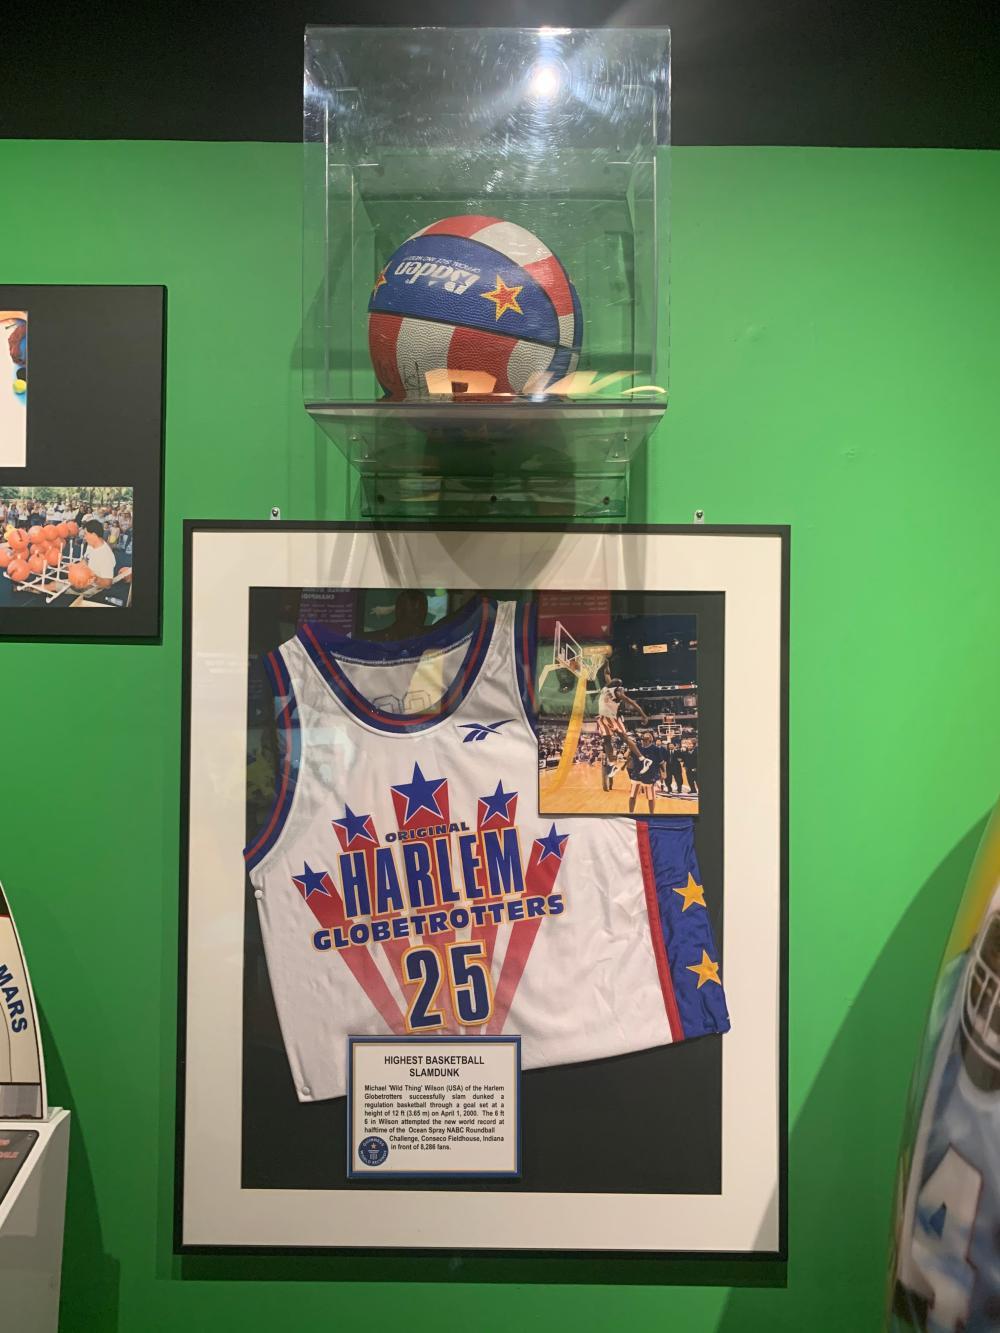 Harlem Globetrotters Museum Display & Signed Basketball